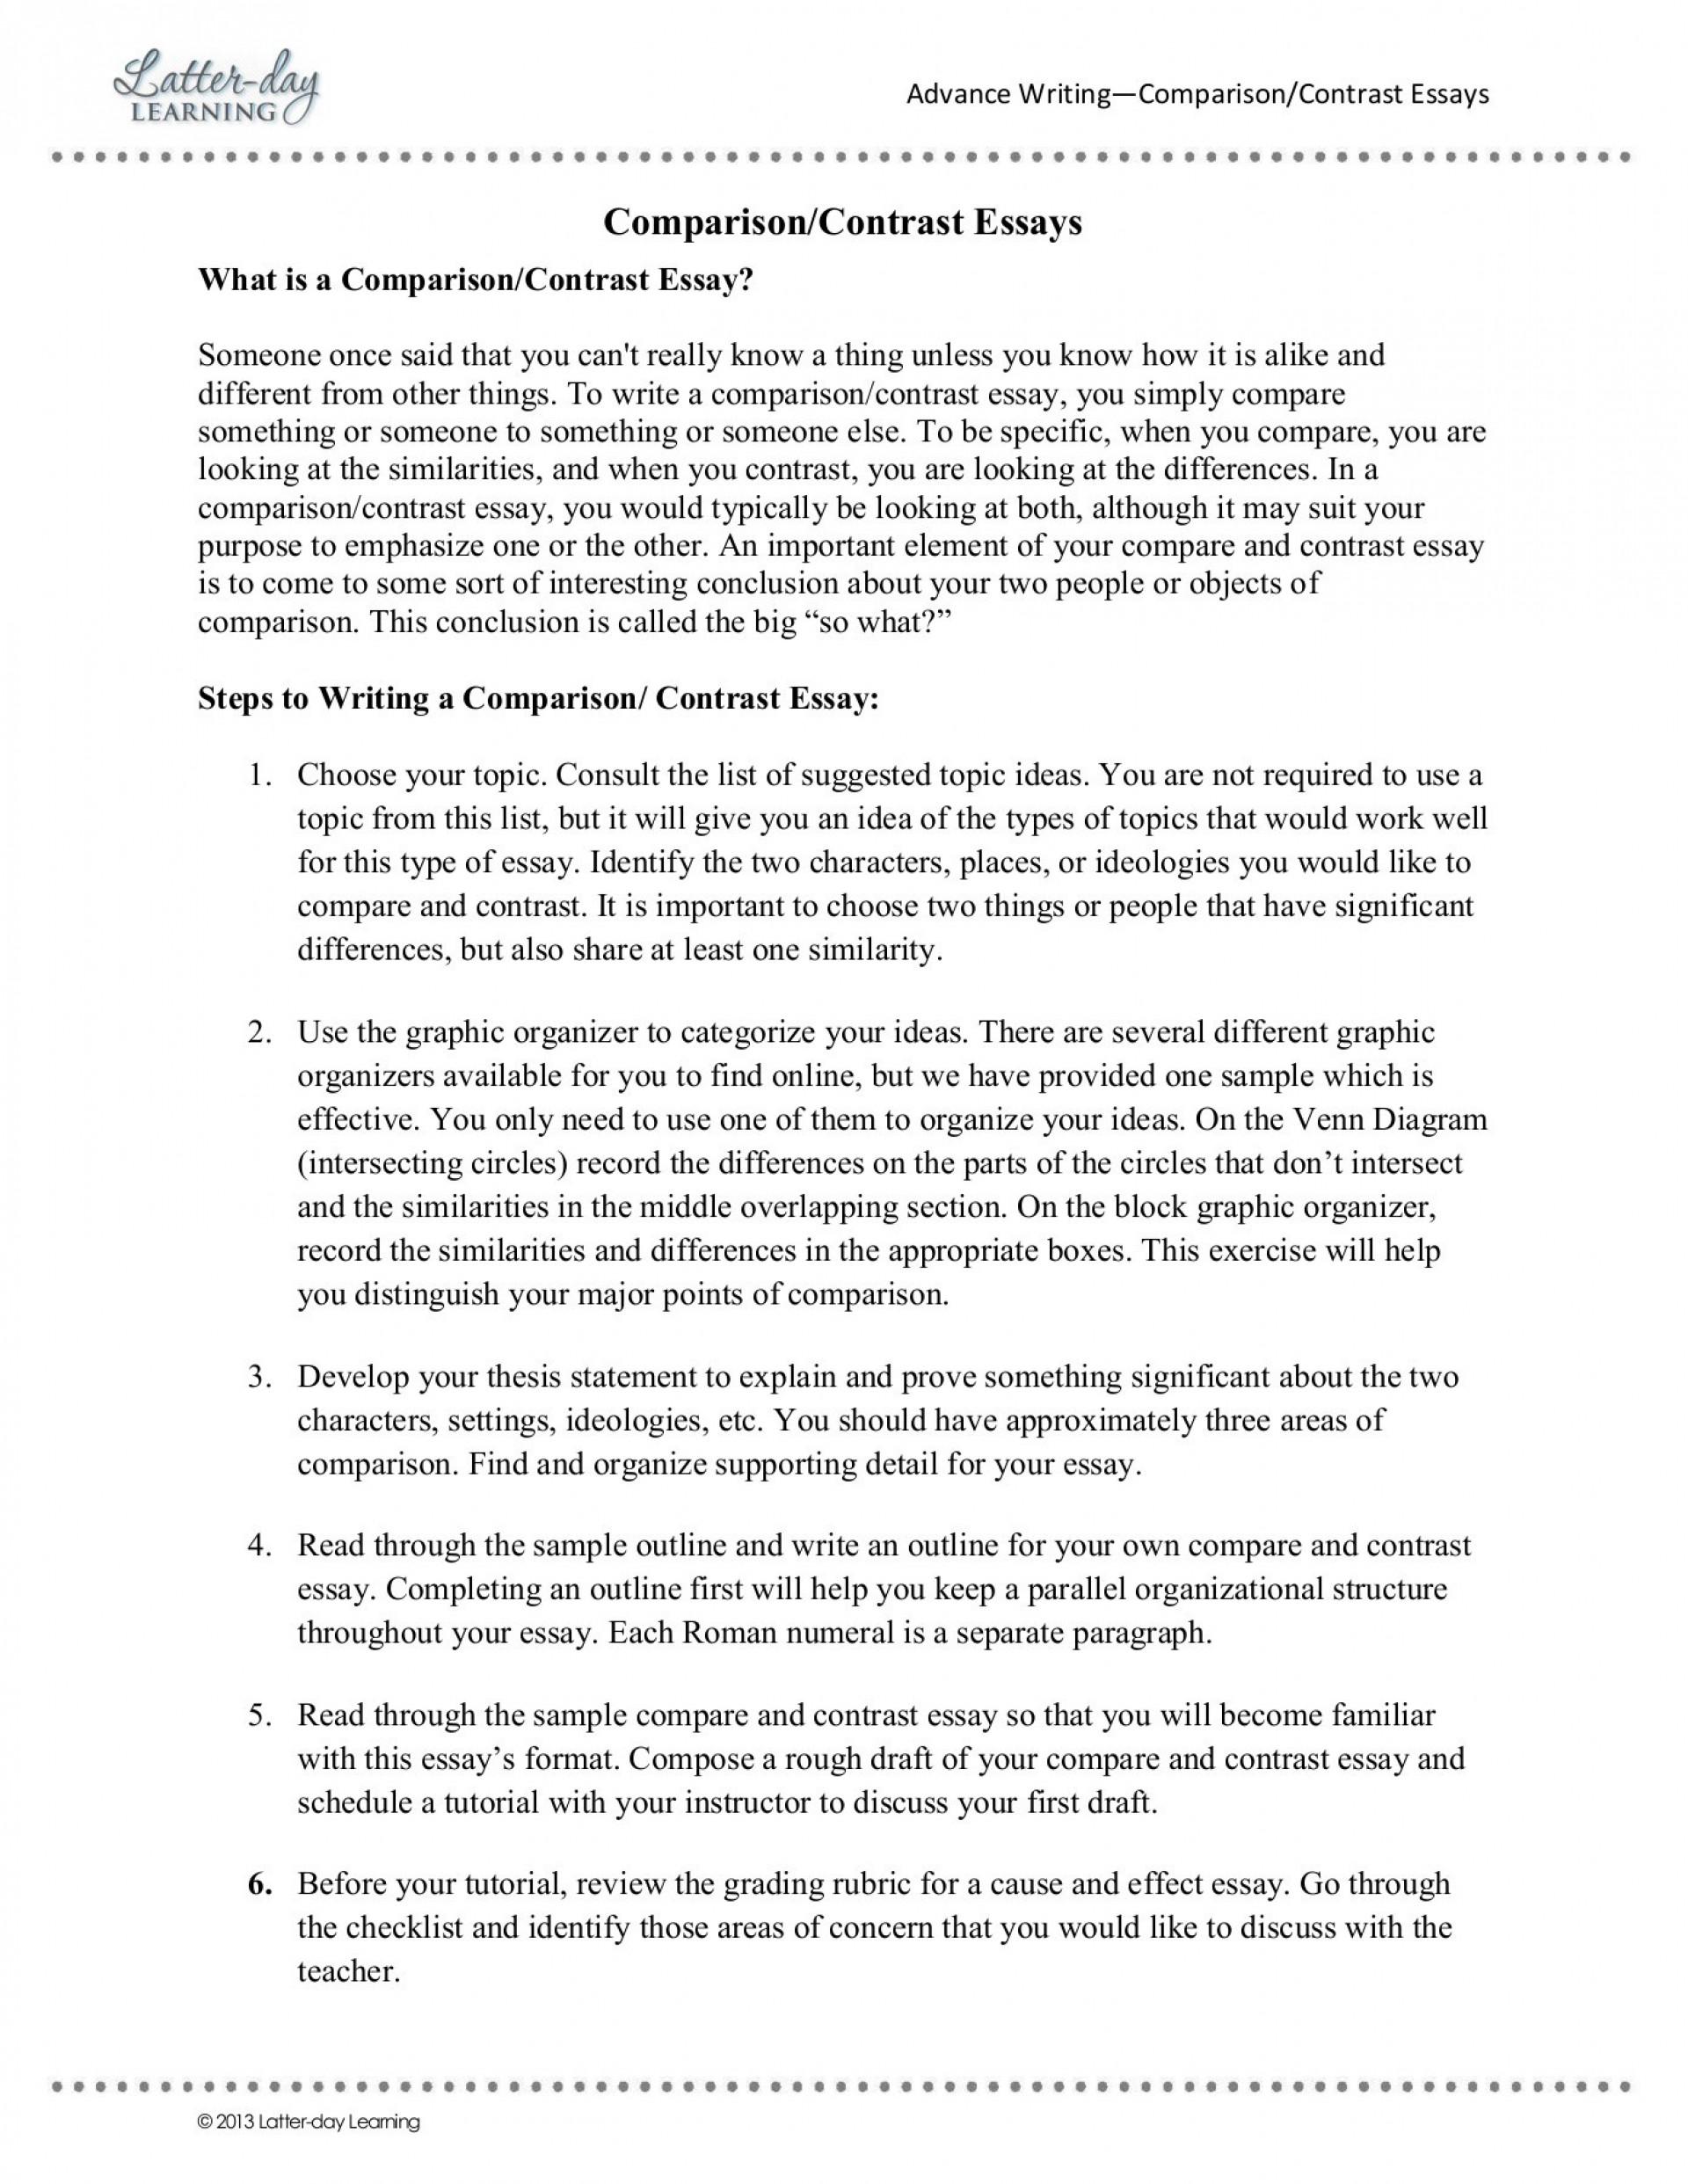 013 Comparison Contrast Essay Example Beautiful Compare Format College Graphic Organizer Pdf Examples 1920